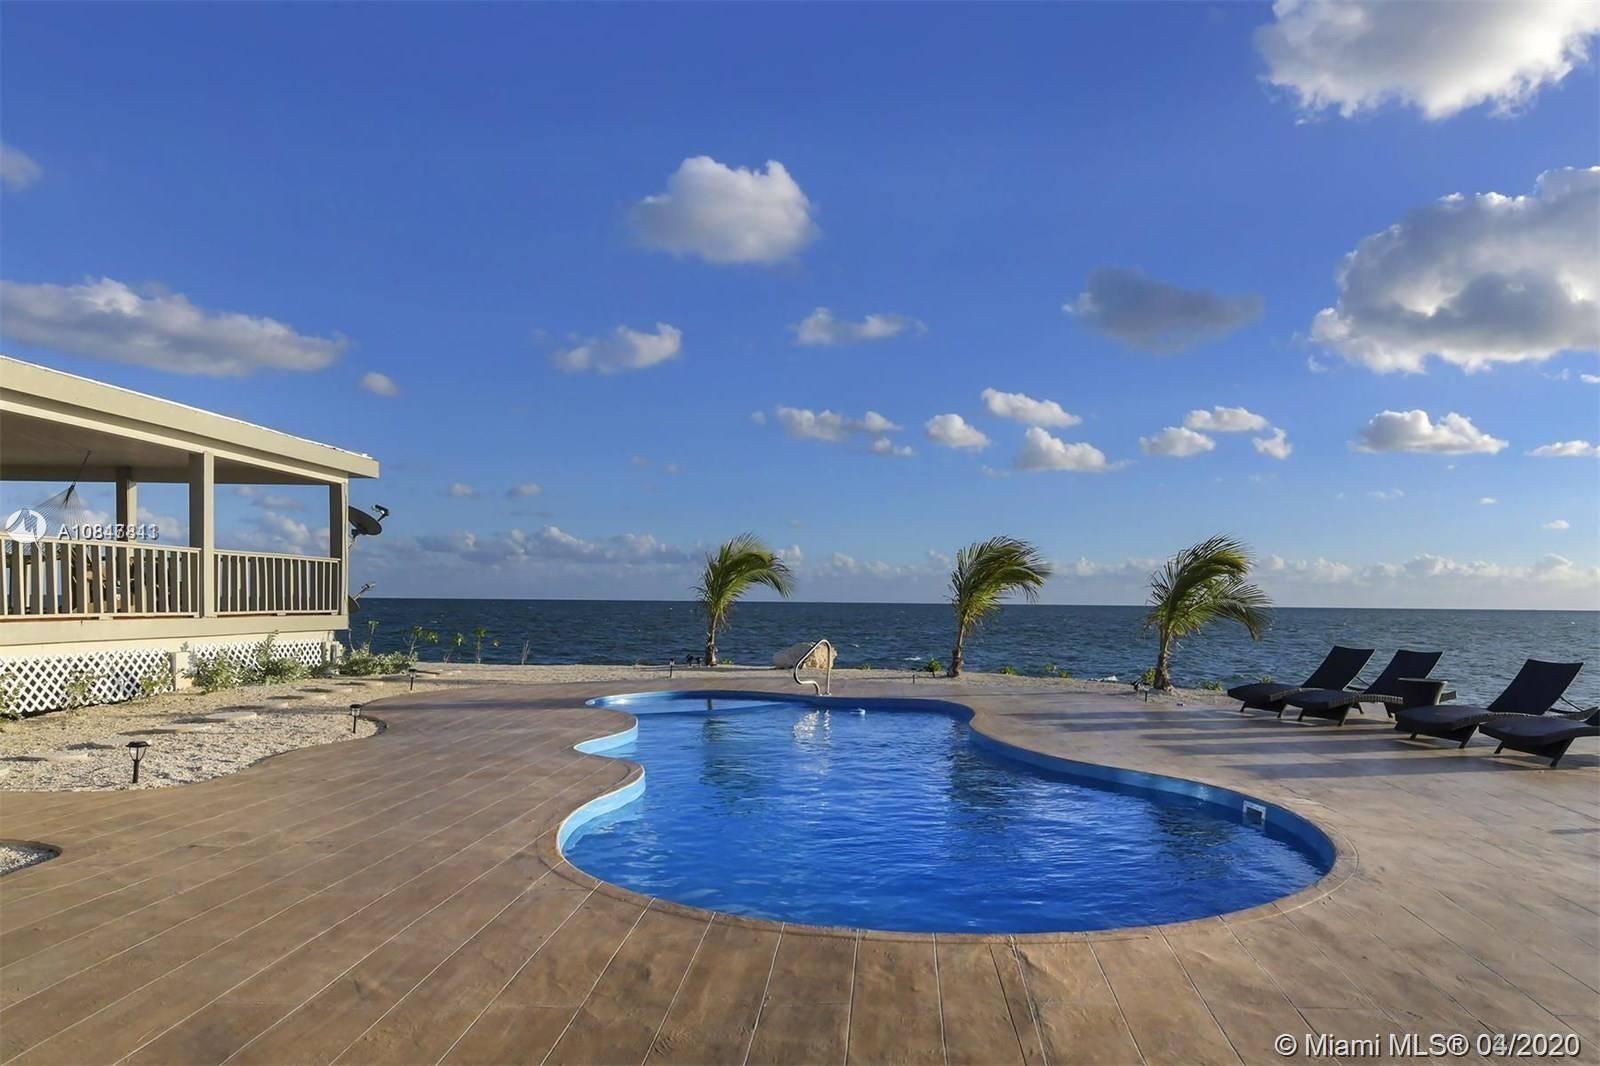 Main property image for  0 1 Eco Resort Hotel FL Keys